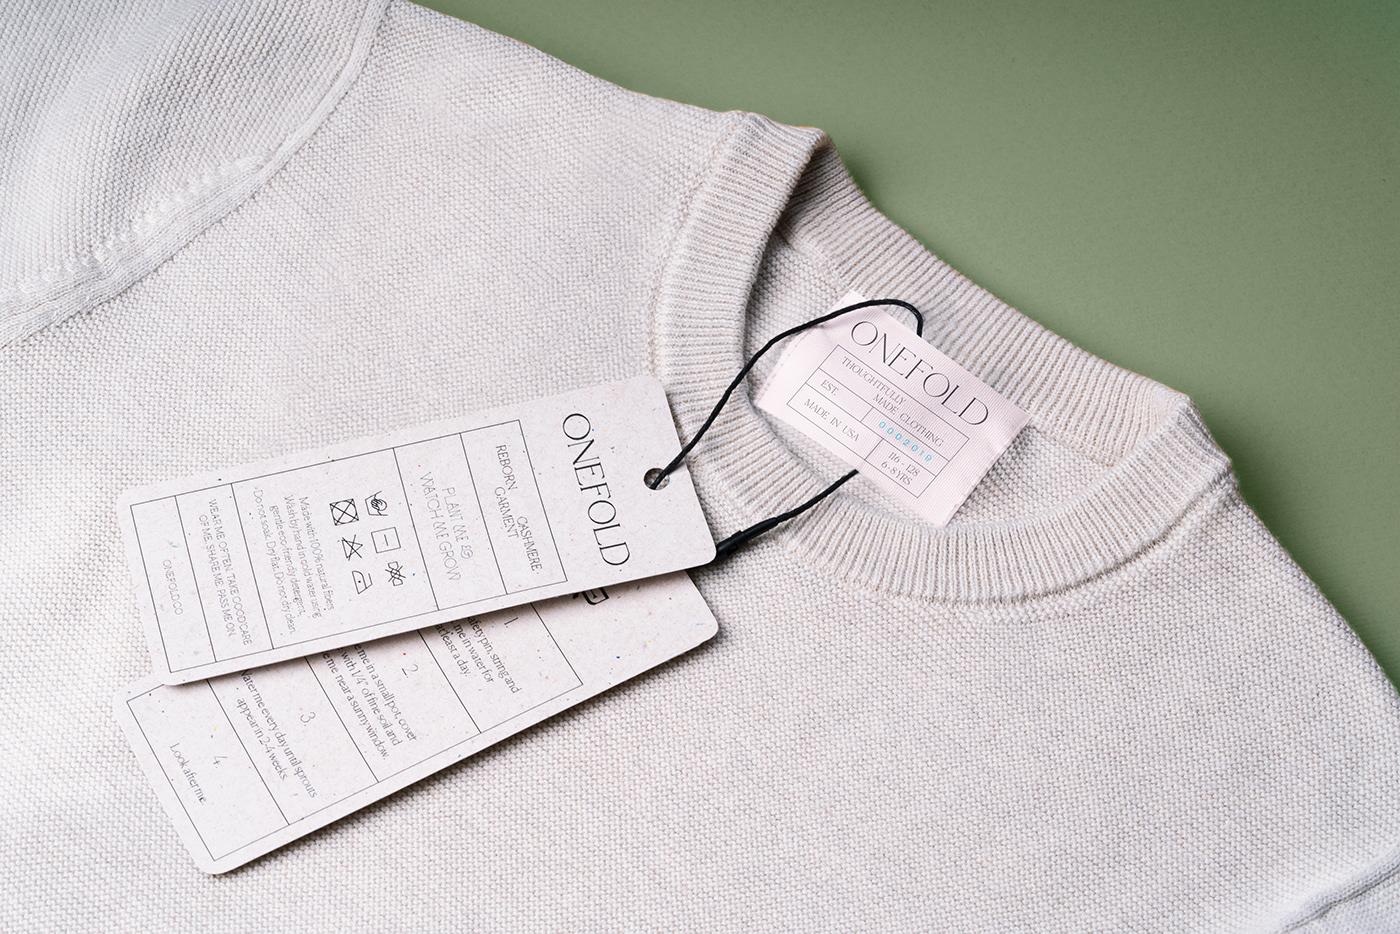 branding  byFutura Clothing editorial Futura New York one fold